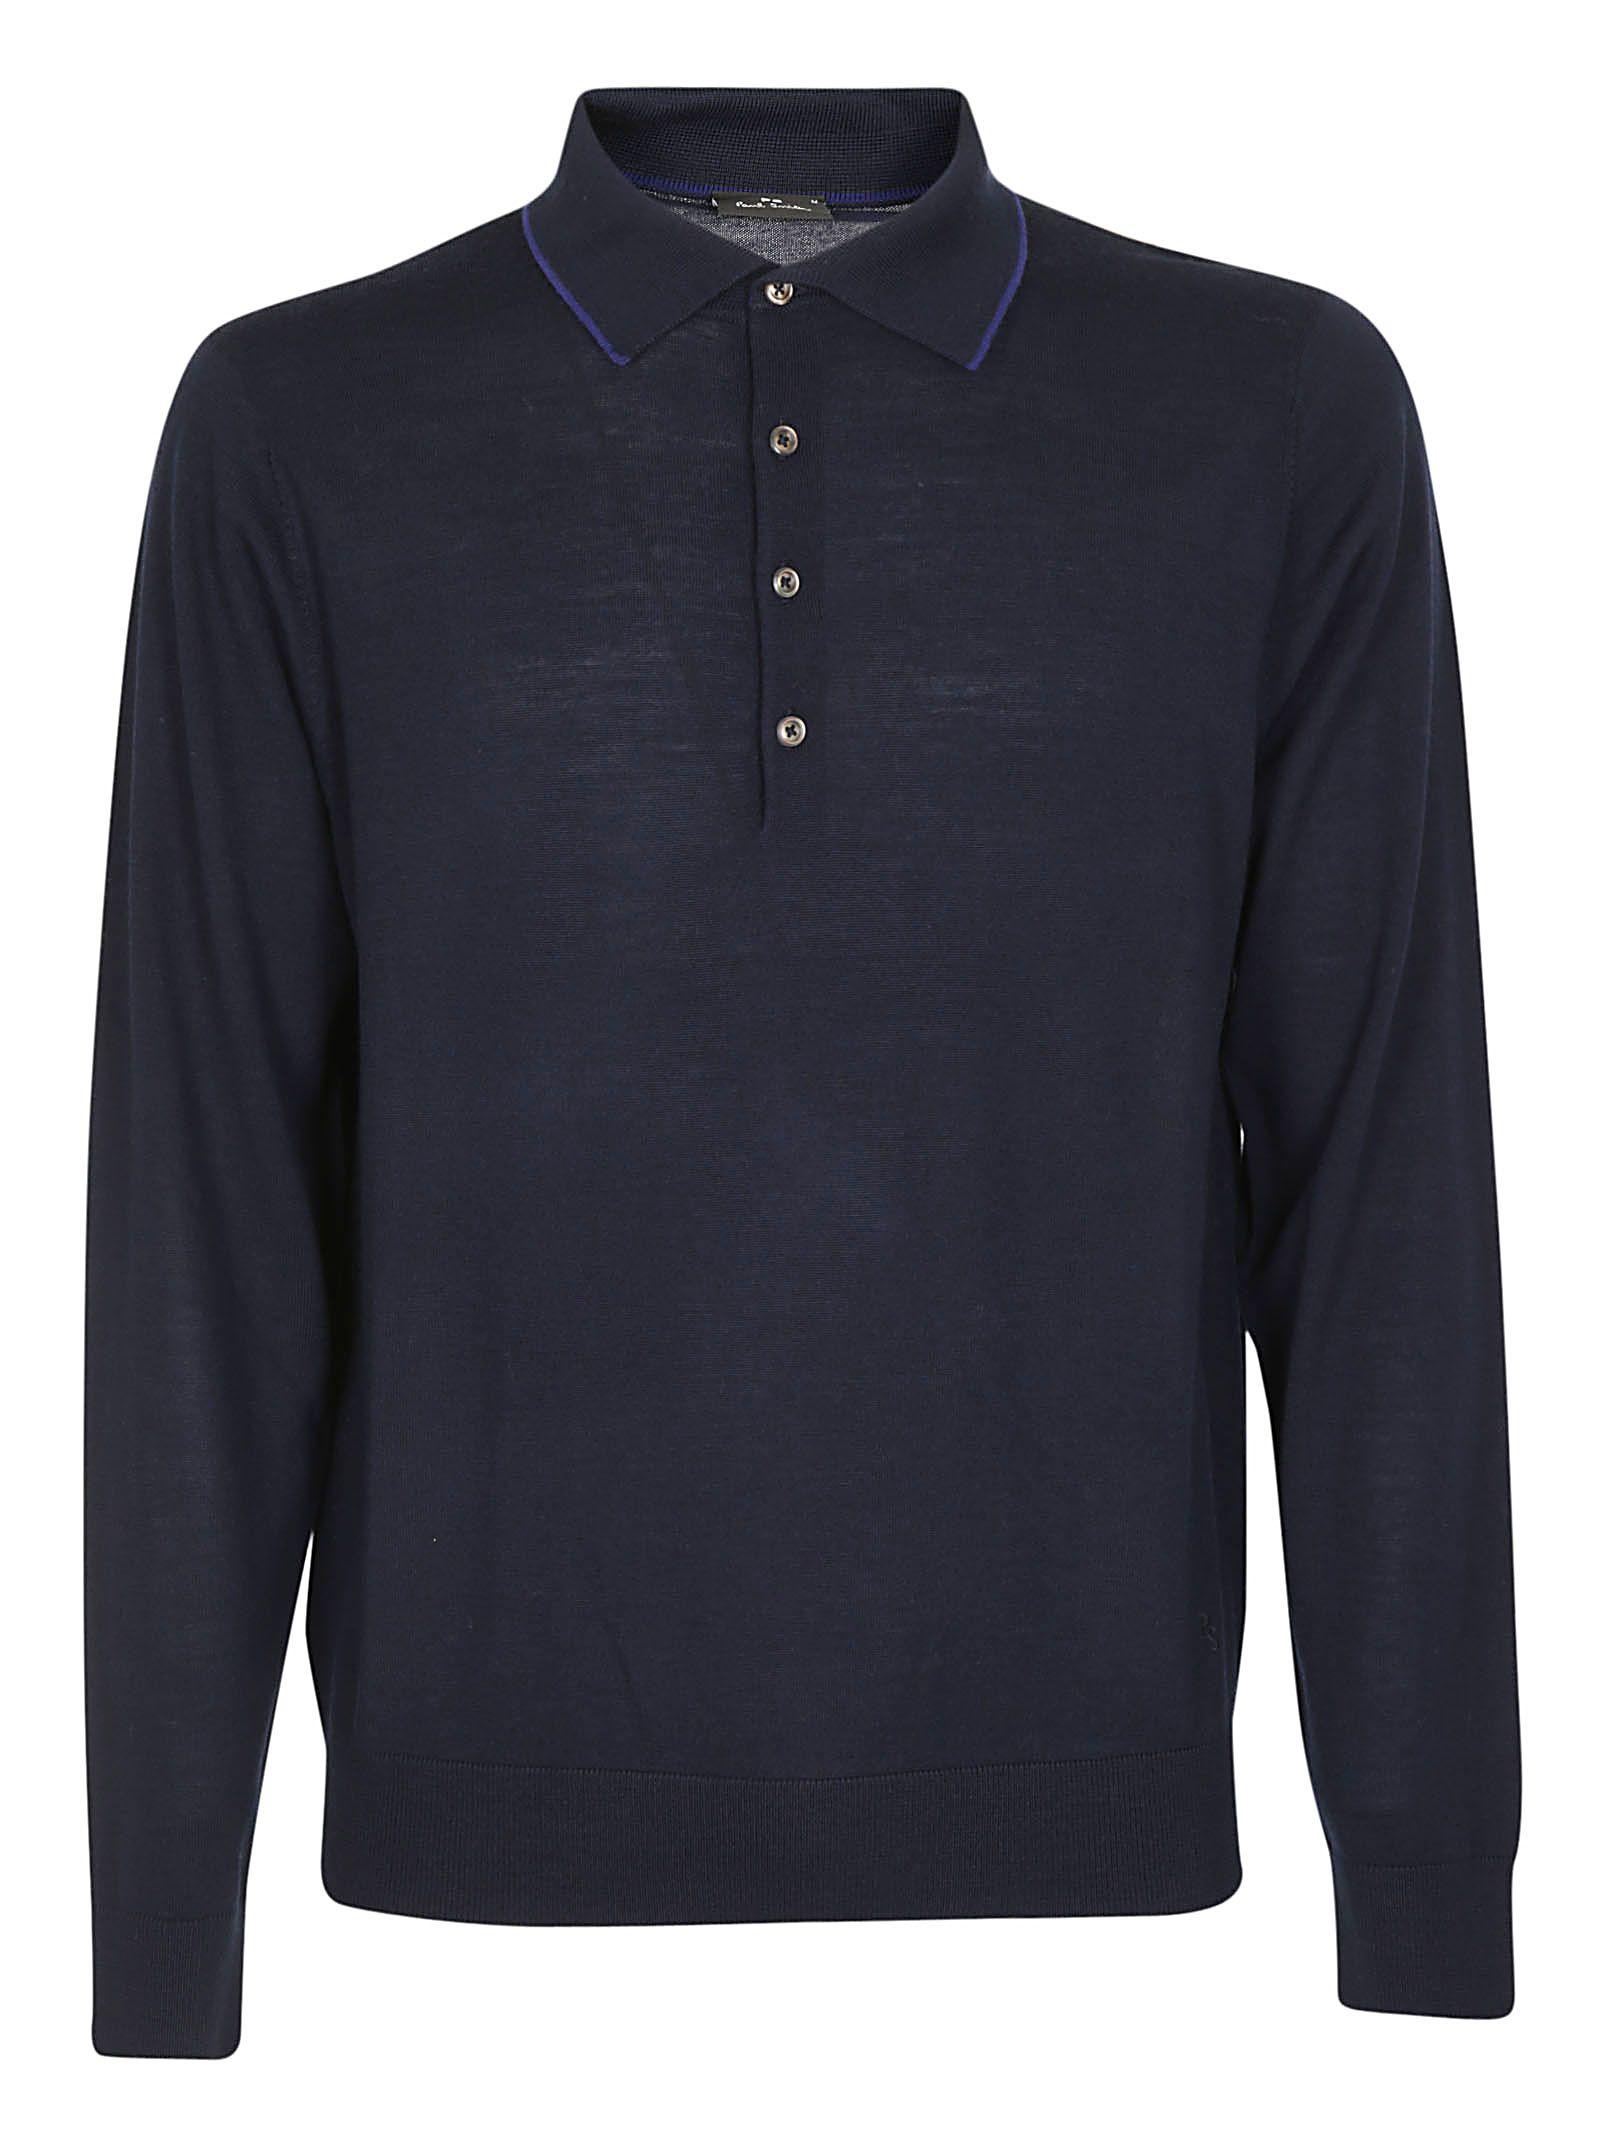 Paul Smith Contrast Polo Shirt